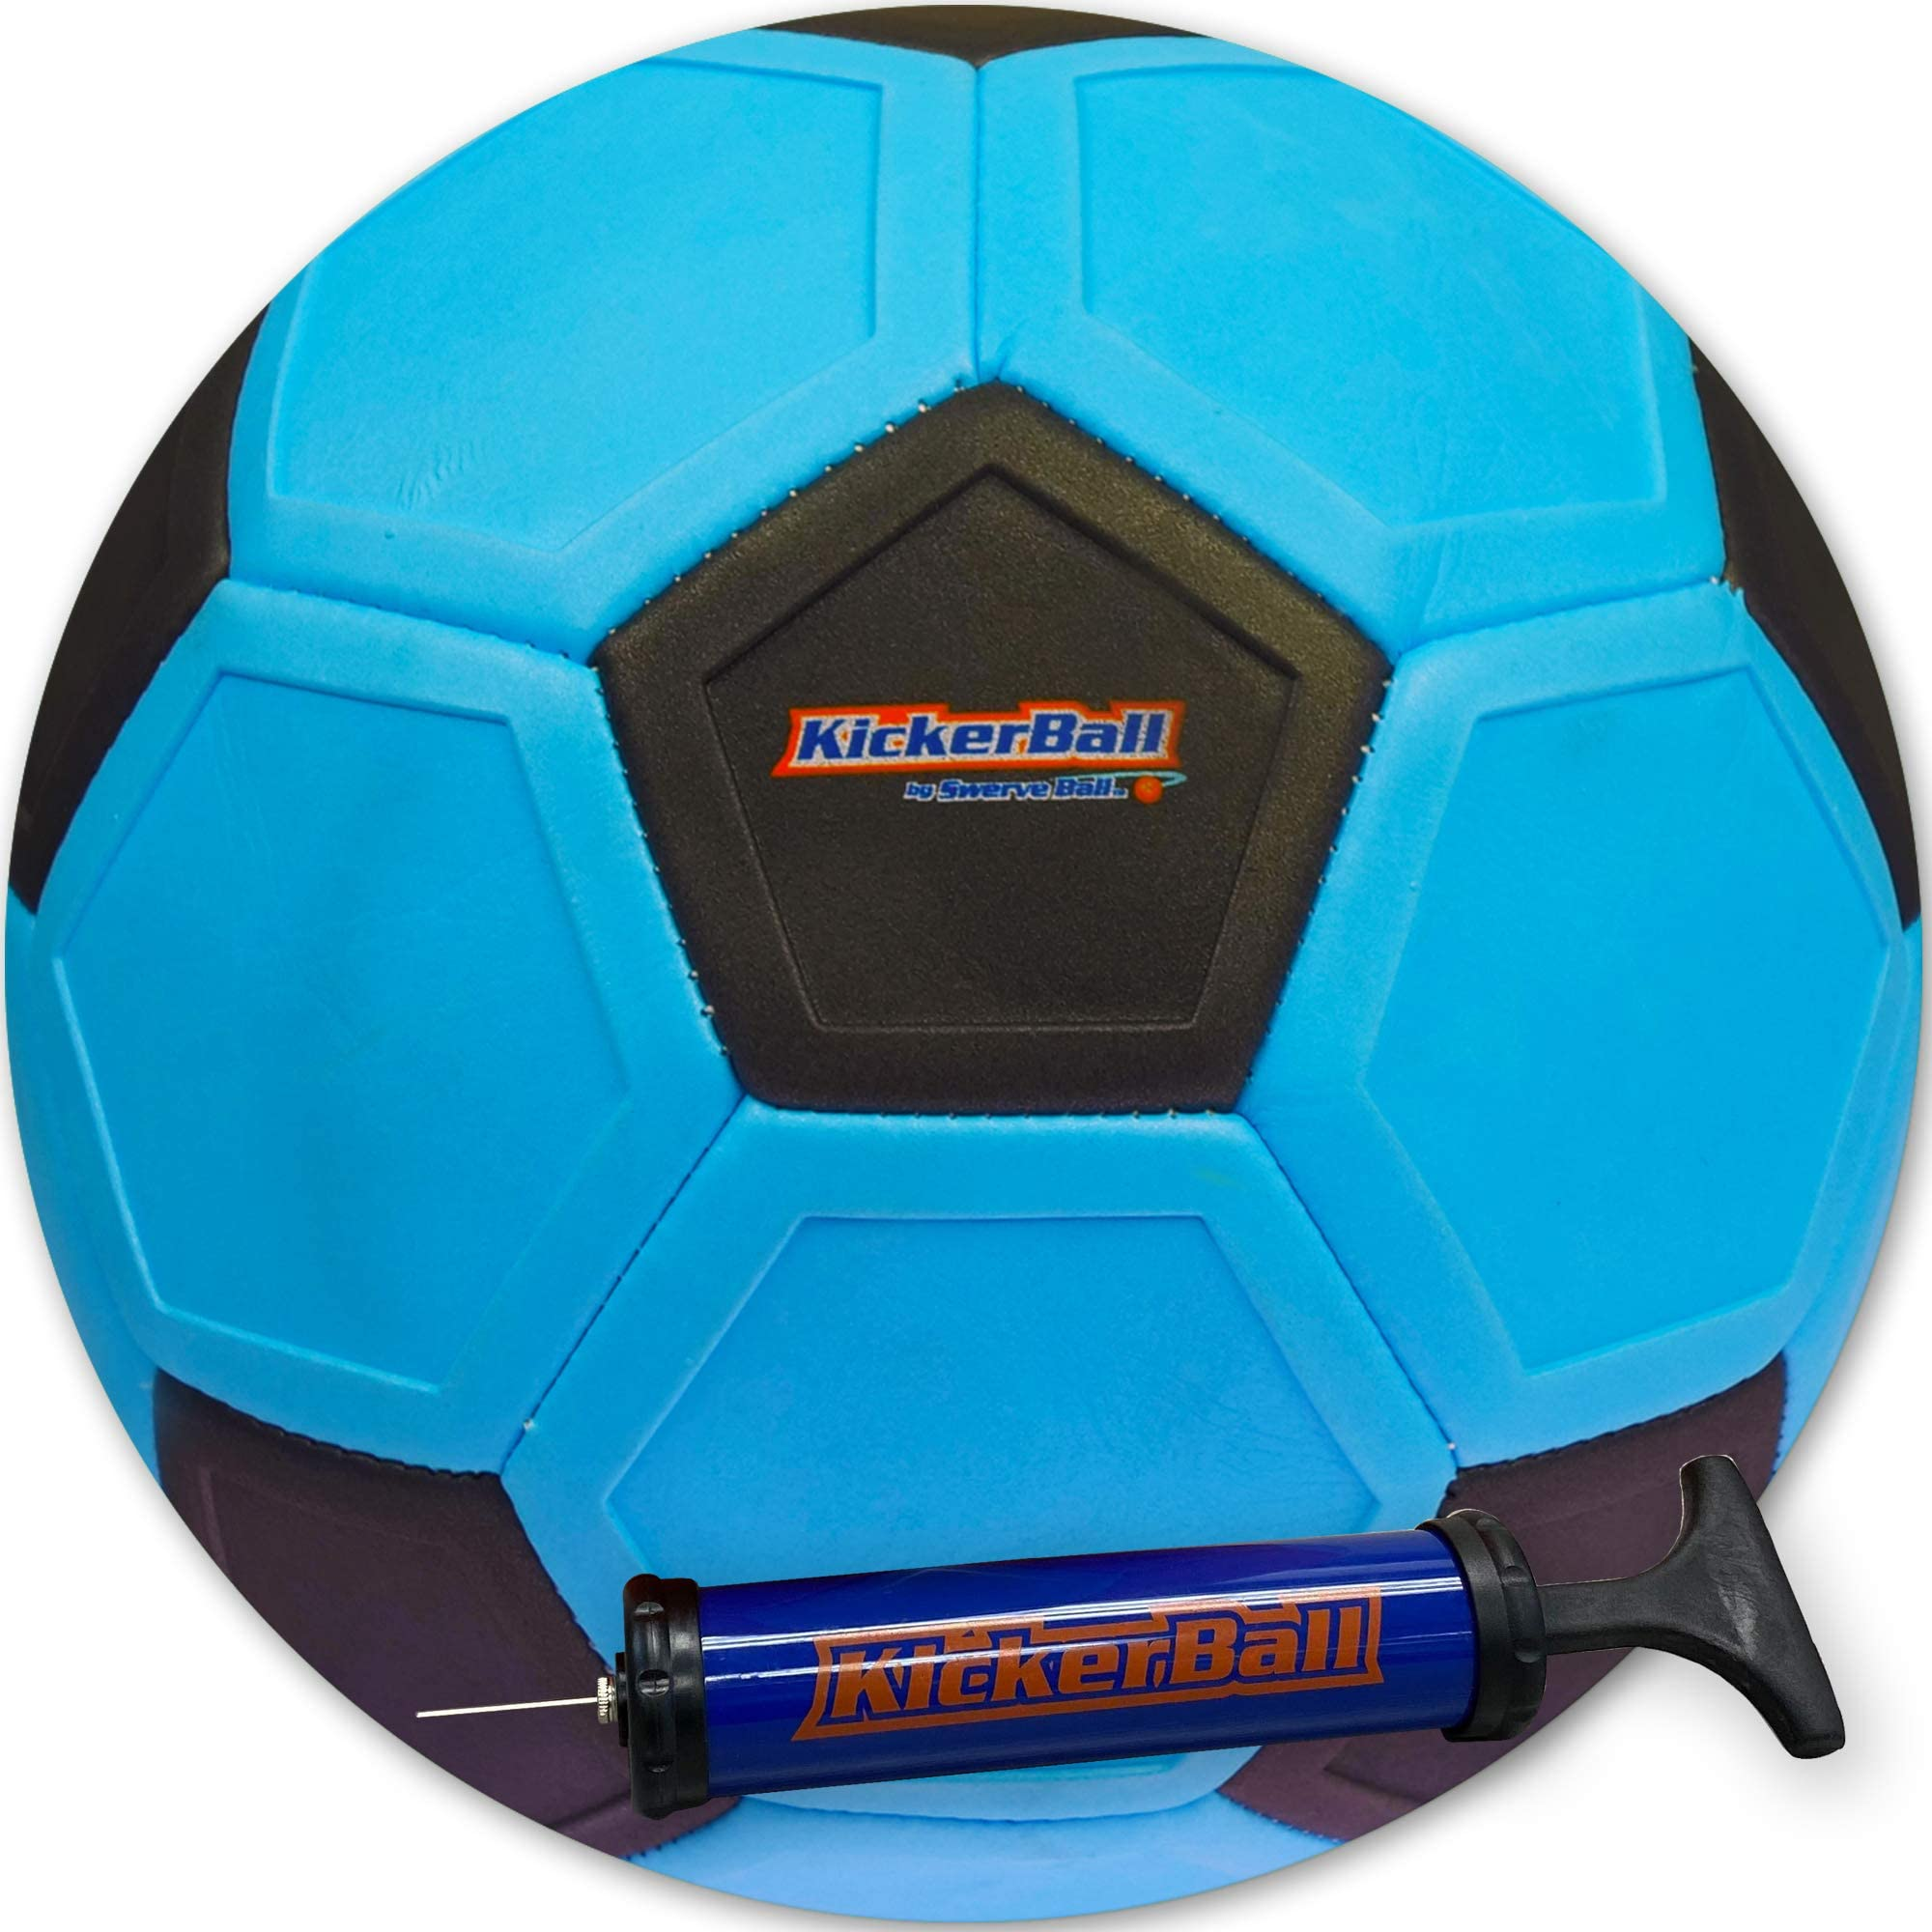 Manometer x Control and Adjusting Pressure x Footballs Football,Volleyball,